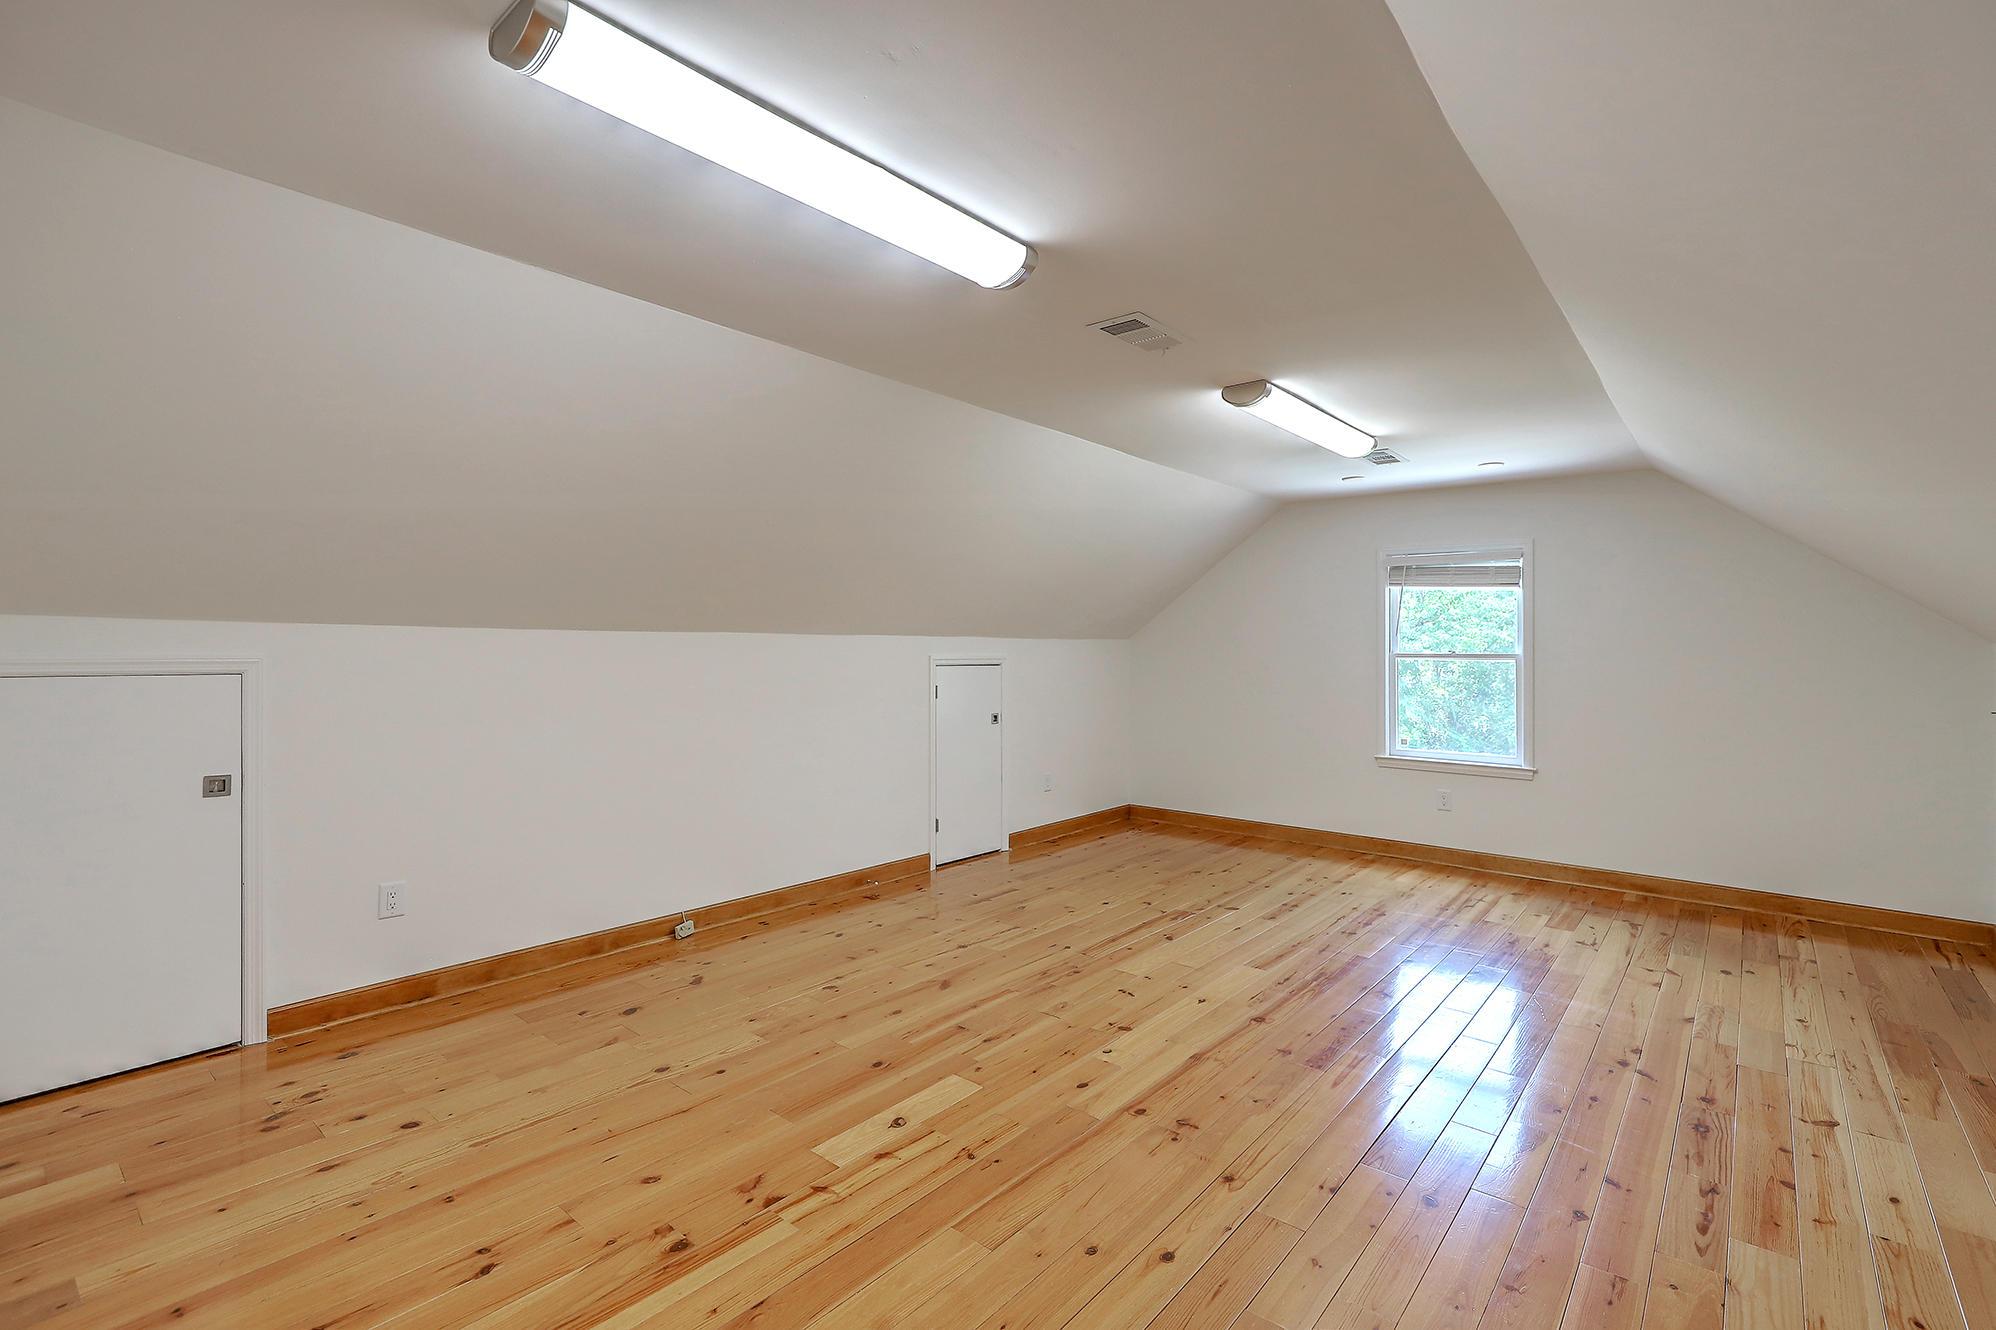 Edgewater Park Homes For Sale - 1413 Edsent, Charleston, SC - 29